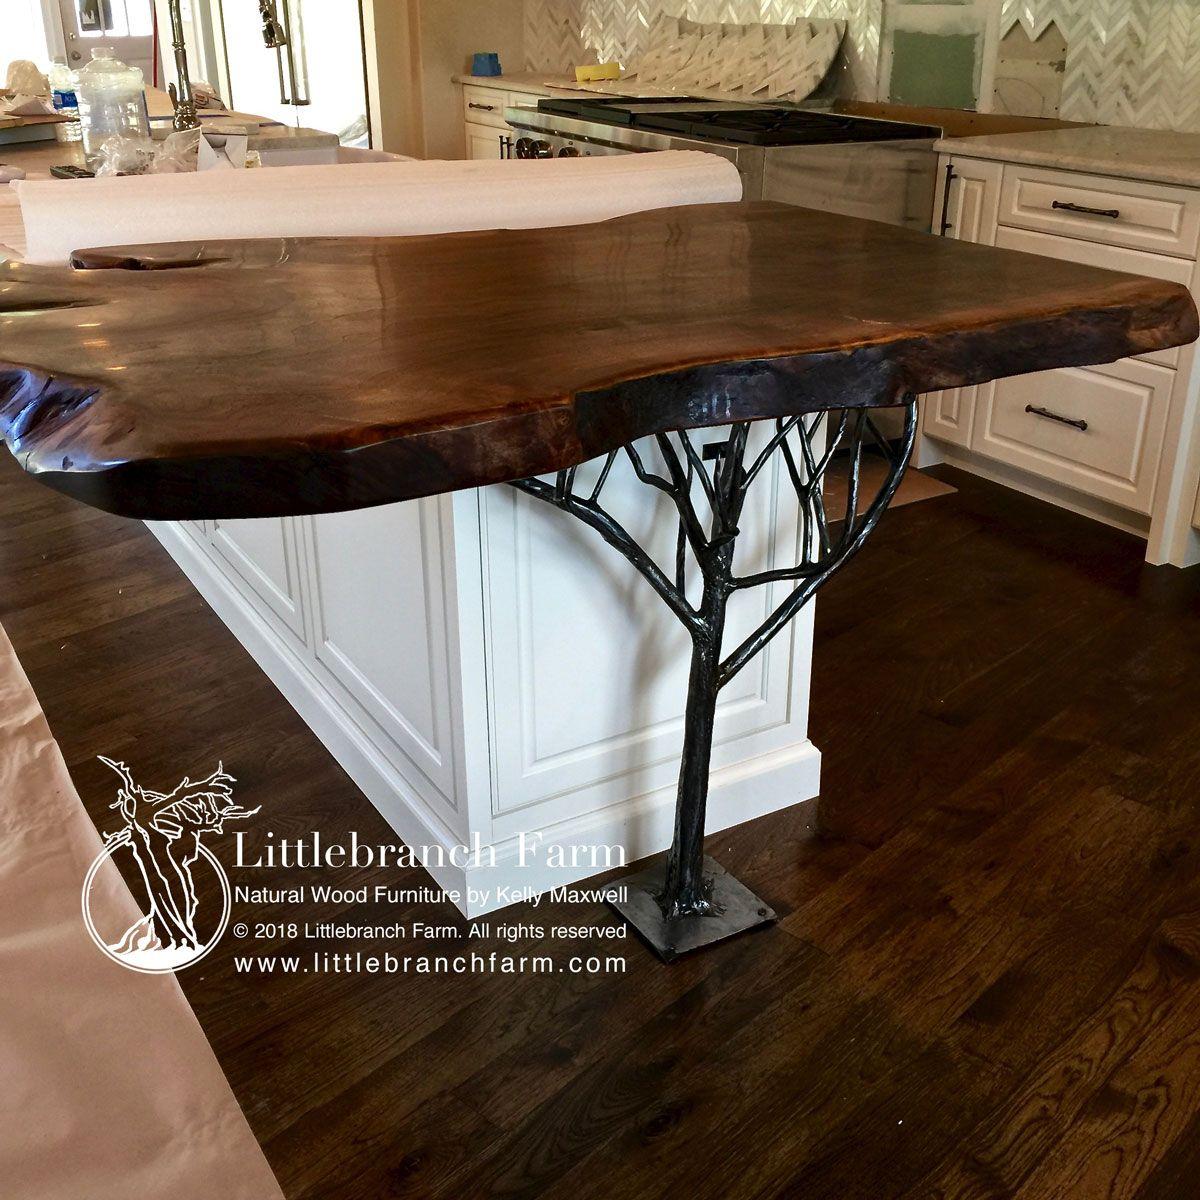 Natural Wood Countertops Live Edge Wood Slabs Littlebranch Farm Wood Countertops Natural Wood Furniture Wood Slab